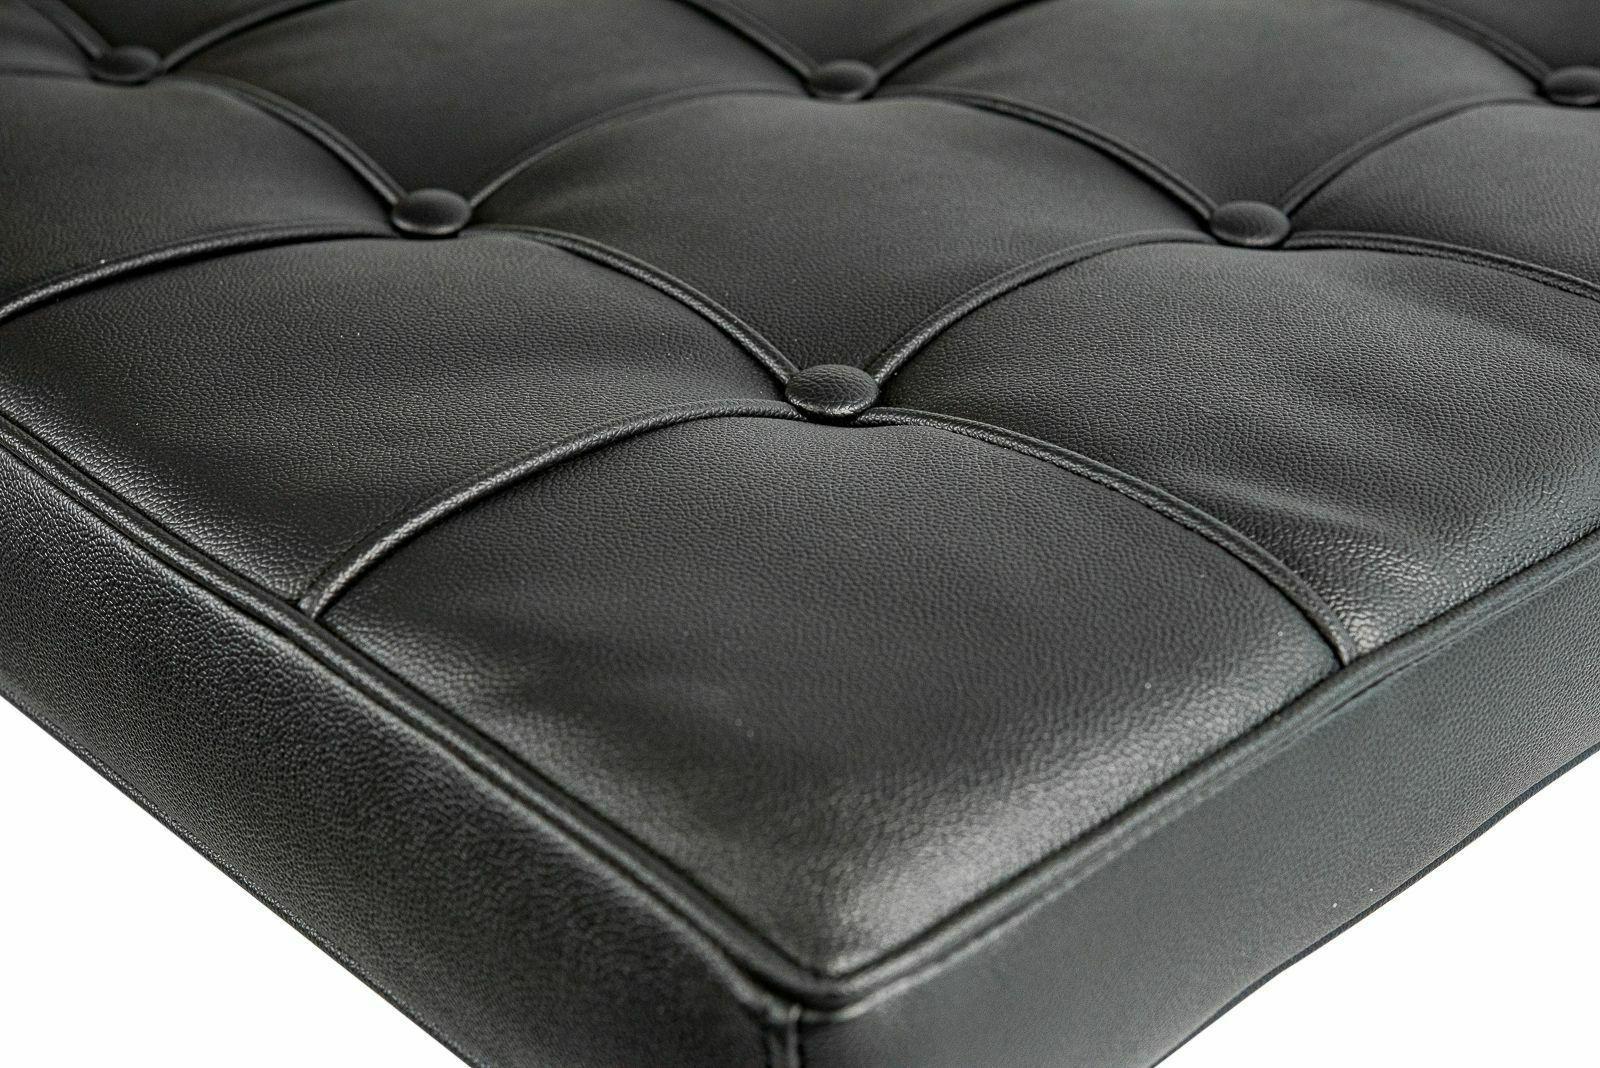 Black Leathersoft Barcelona Cushion Set and Backrest